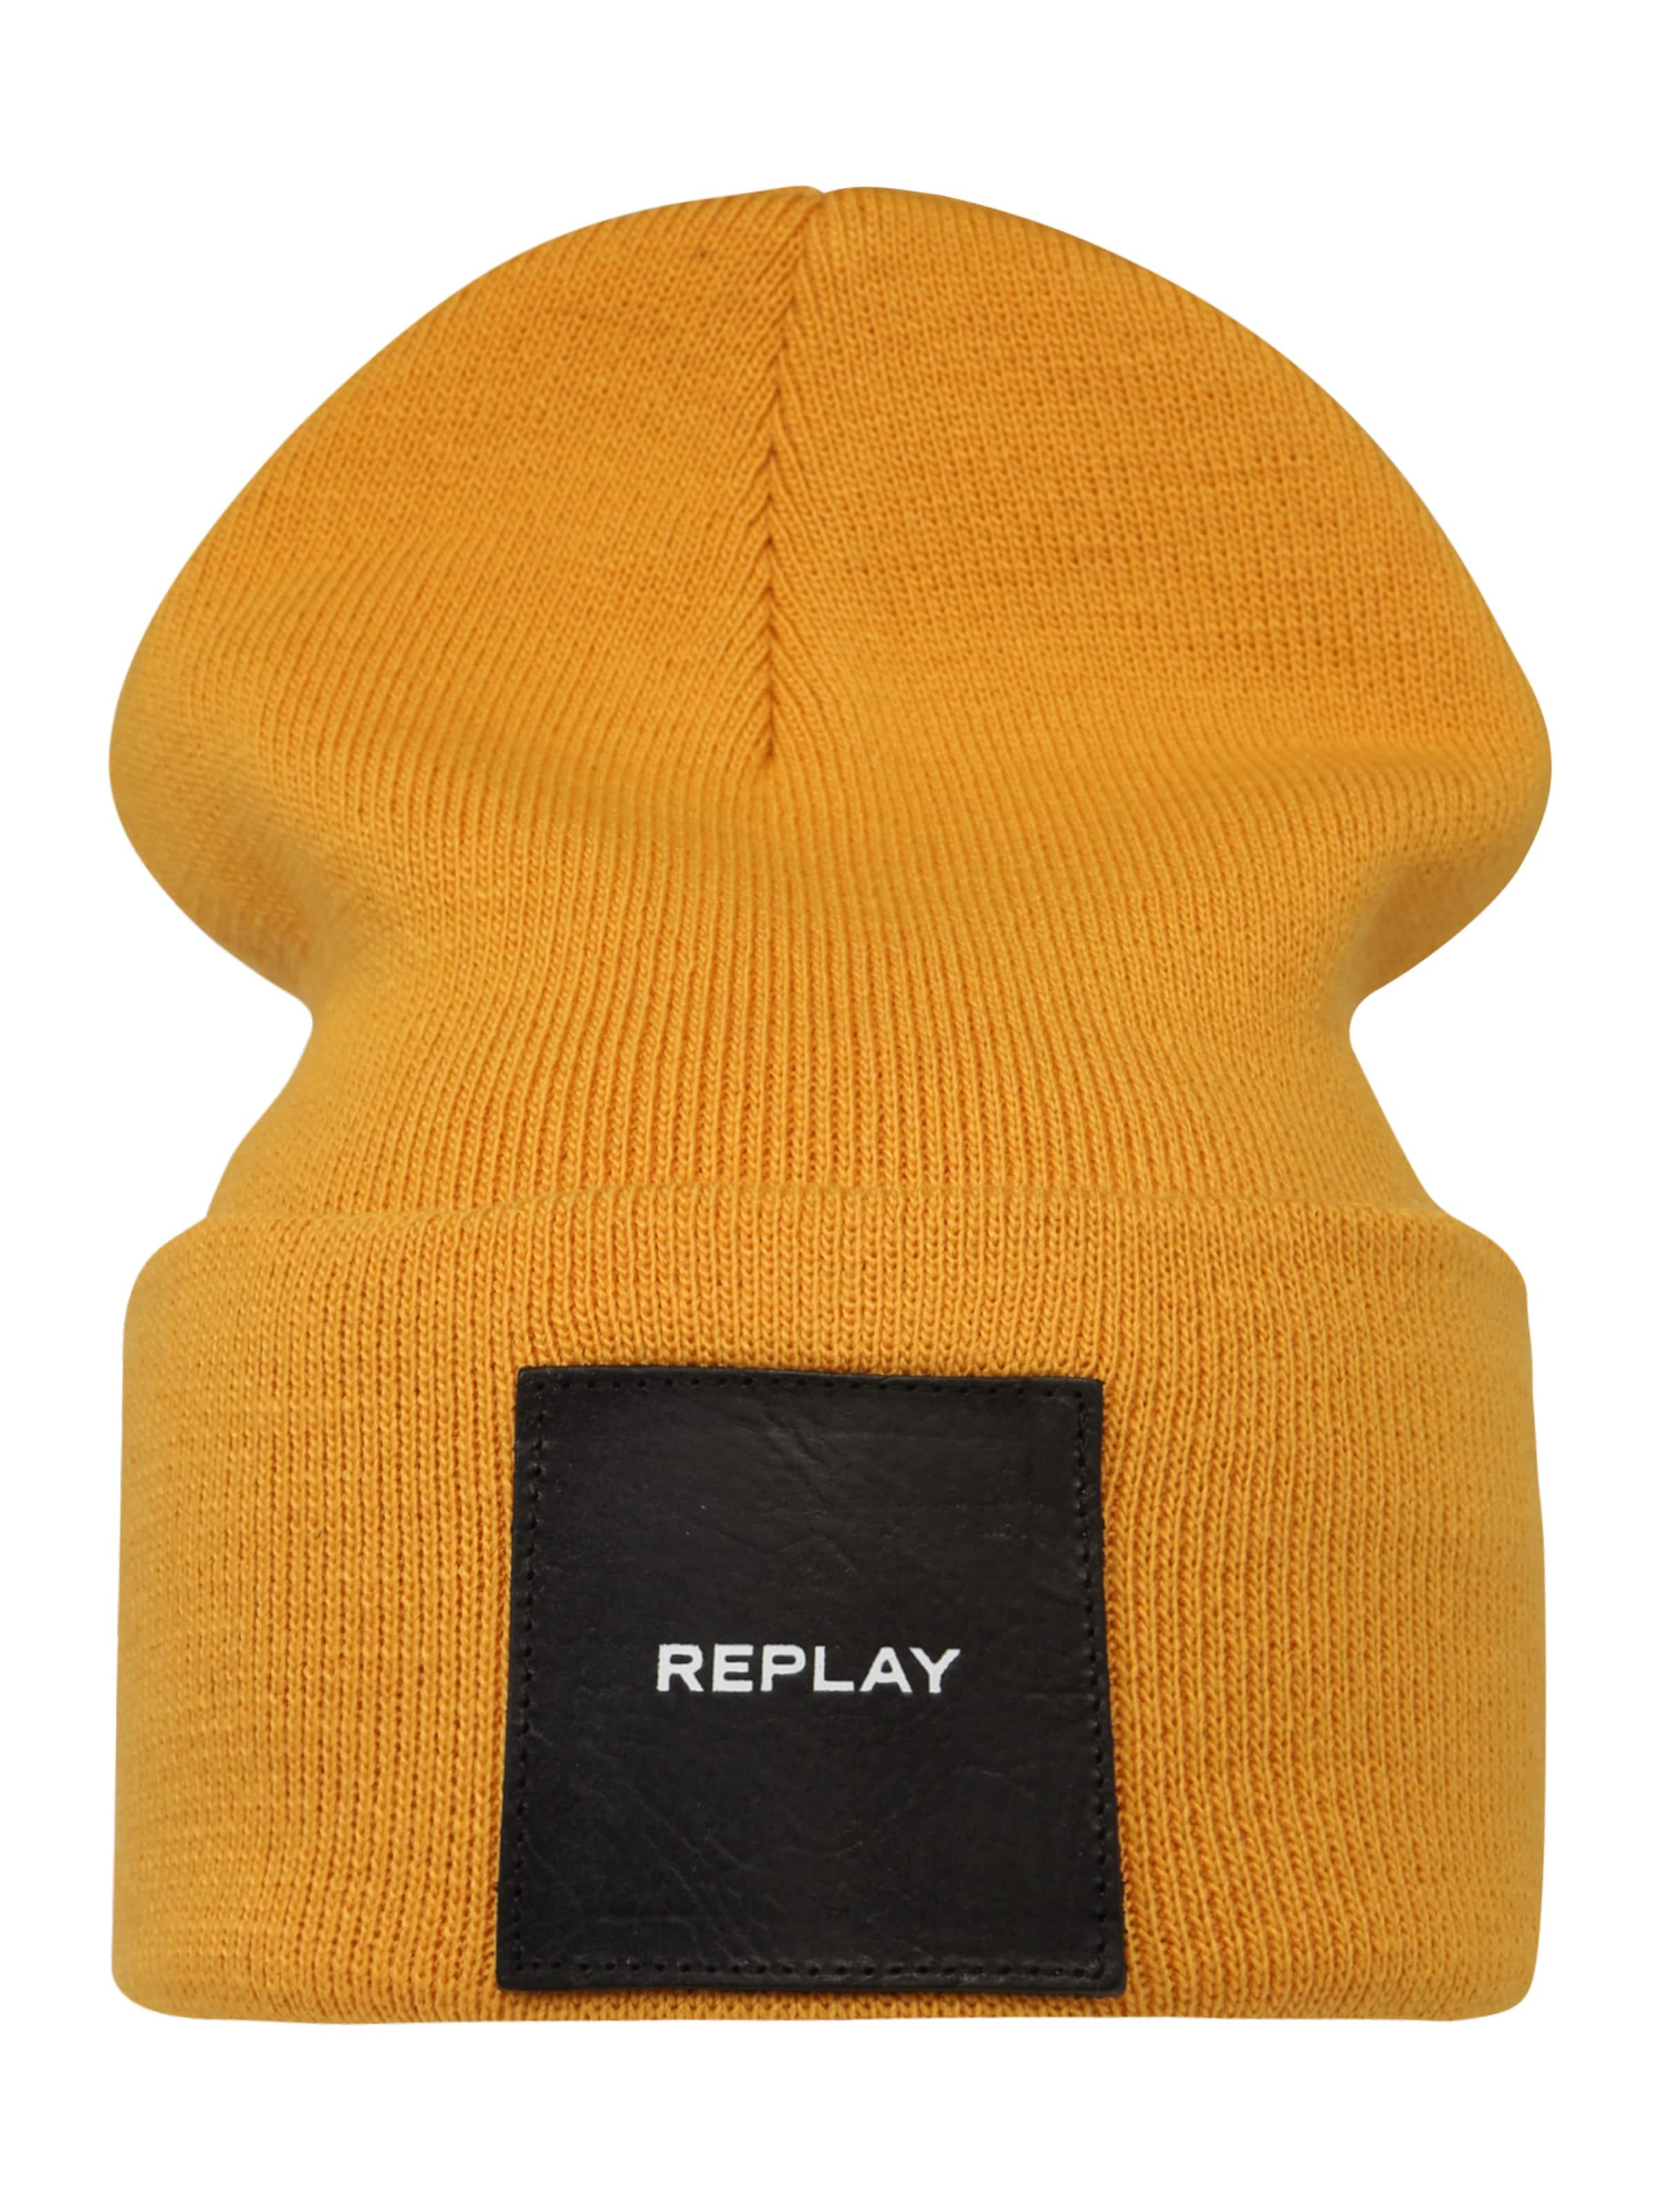 Mütze Replay Replay Gelb Replay Mütze Mütze In Replay Gelb In Gelb In sxrtQChd